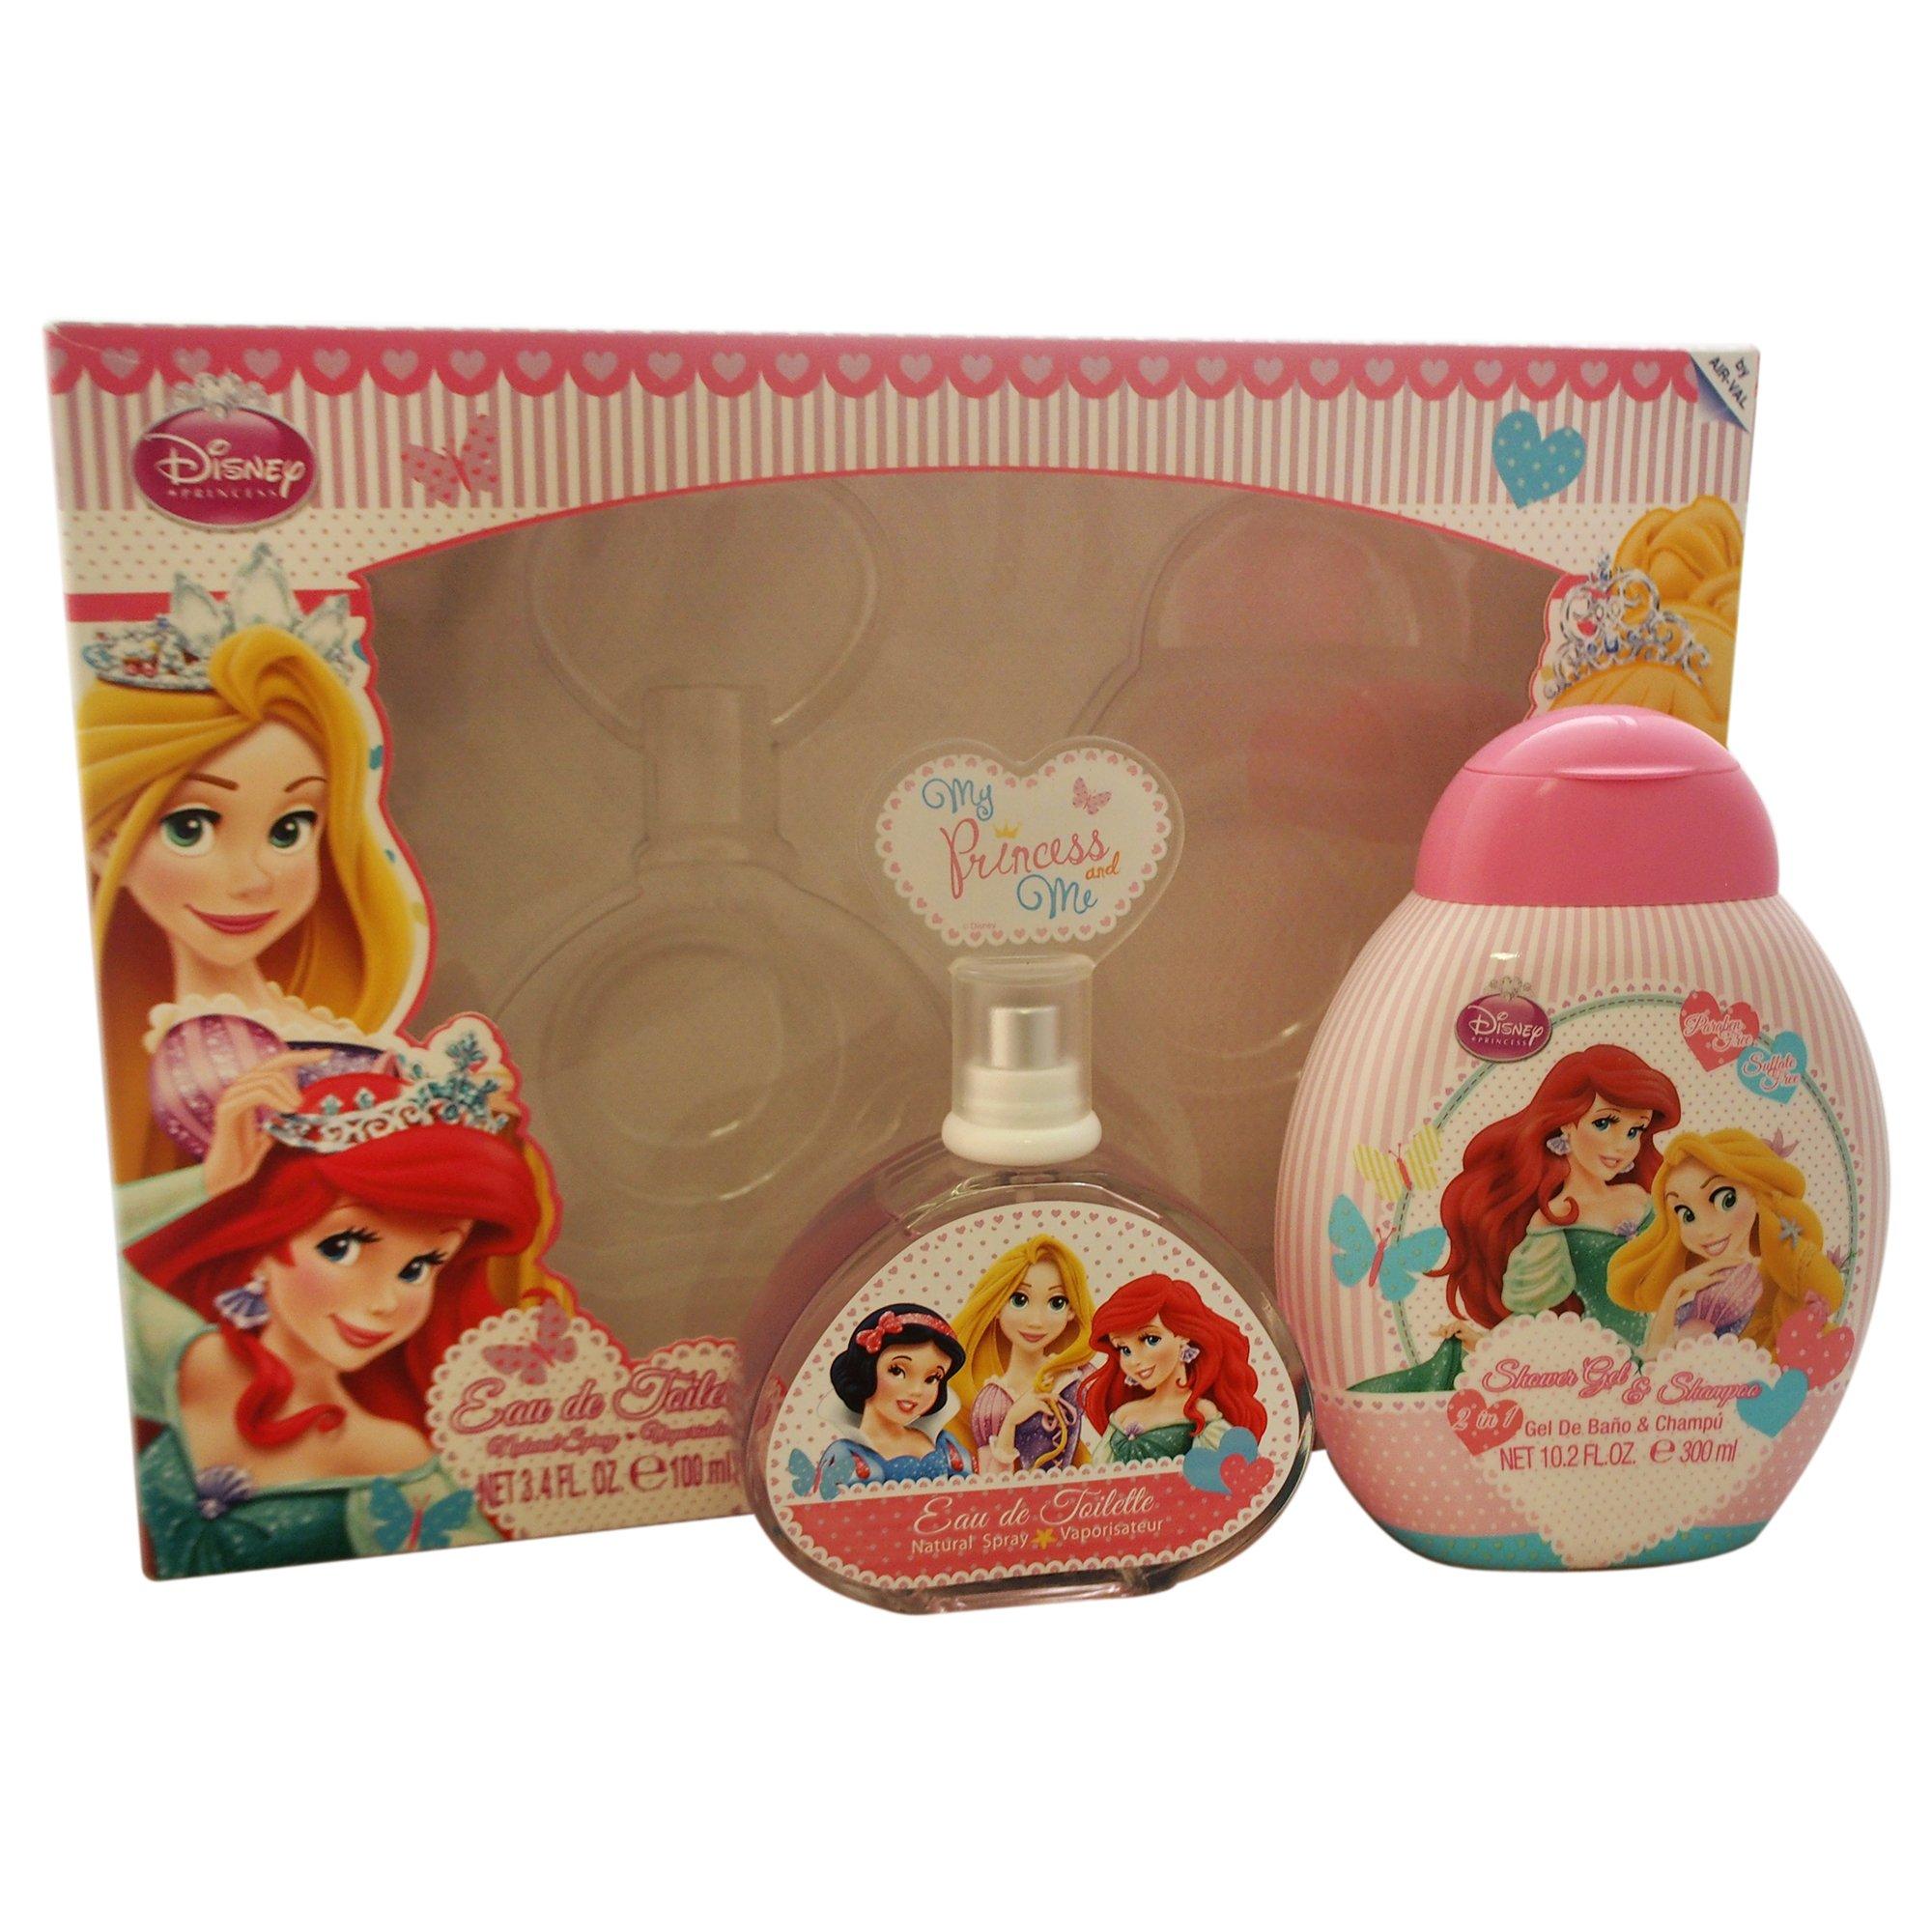 Air-Val International My Princess and Me Eau de Toilette Spray 2 Piece Gift Set for Kids